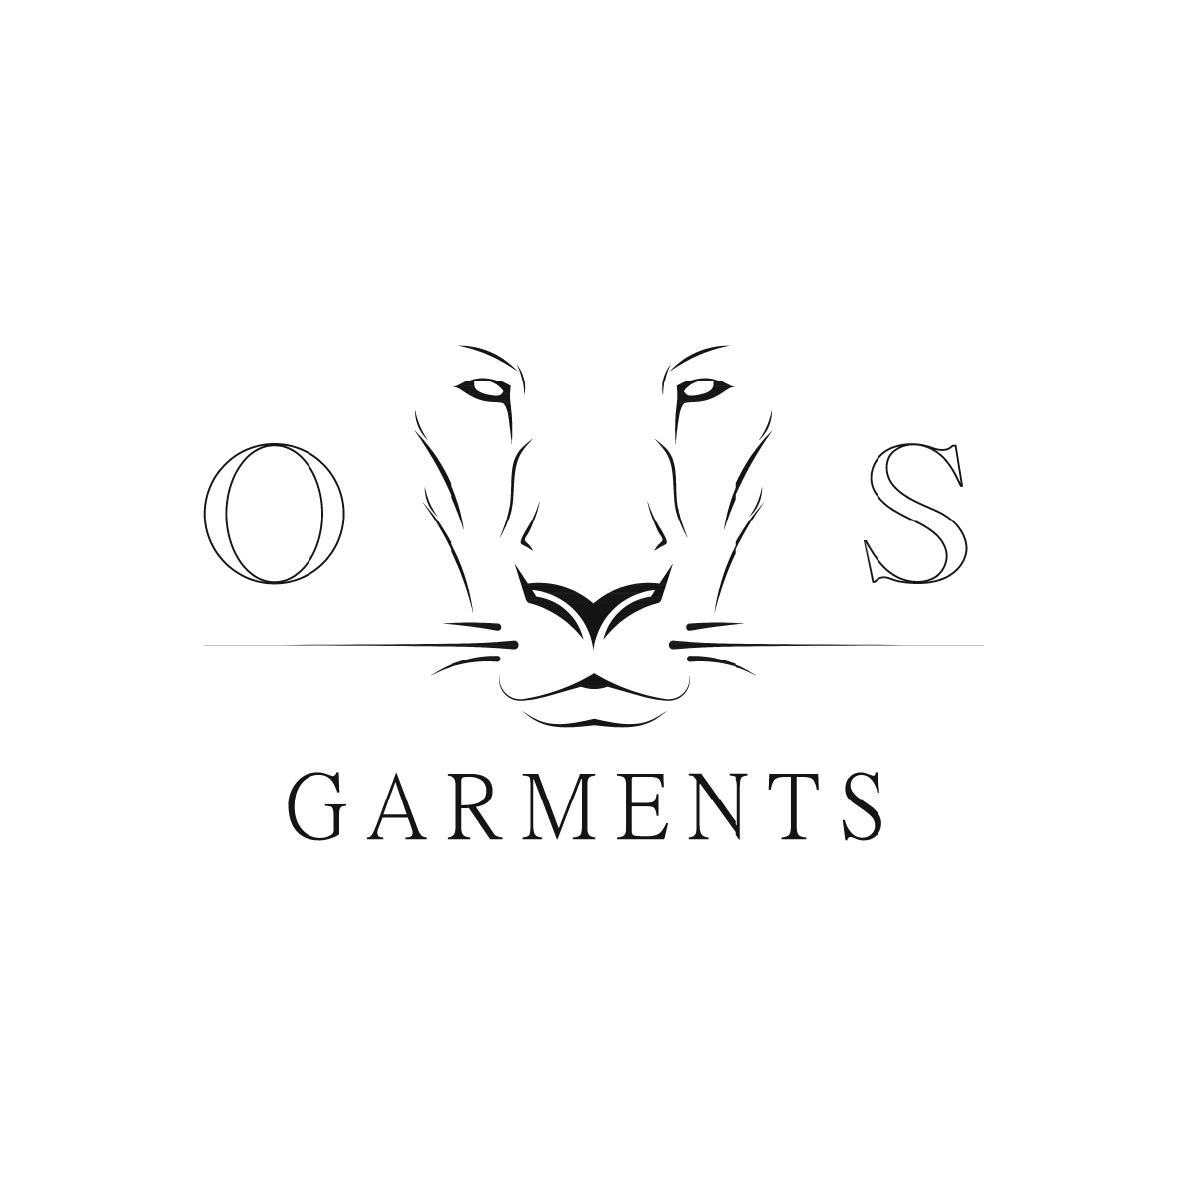 OS Garments